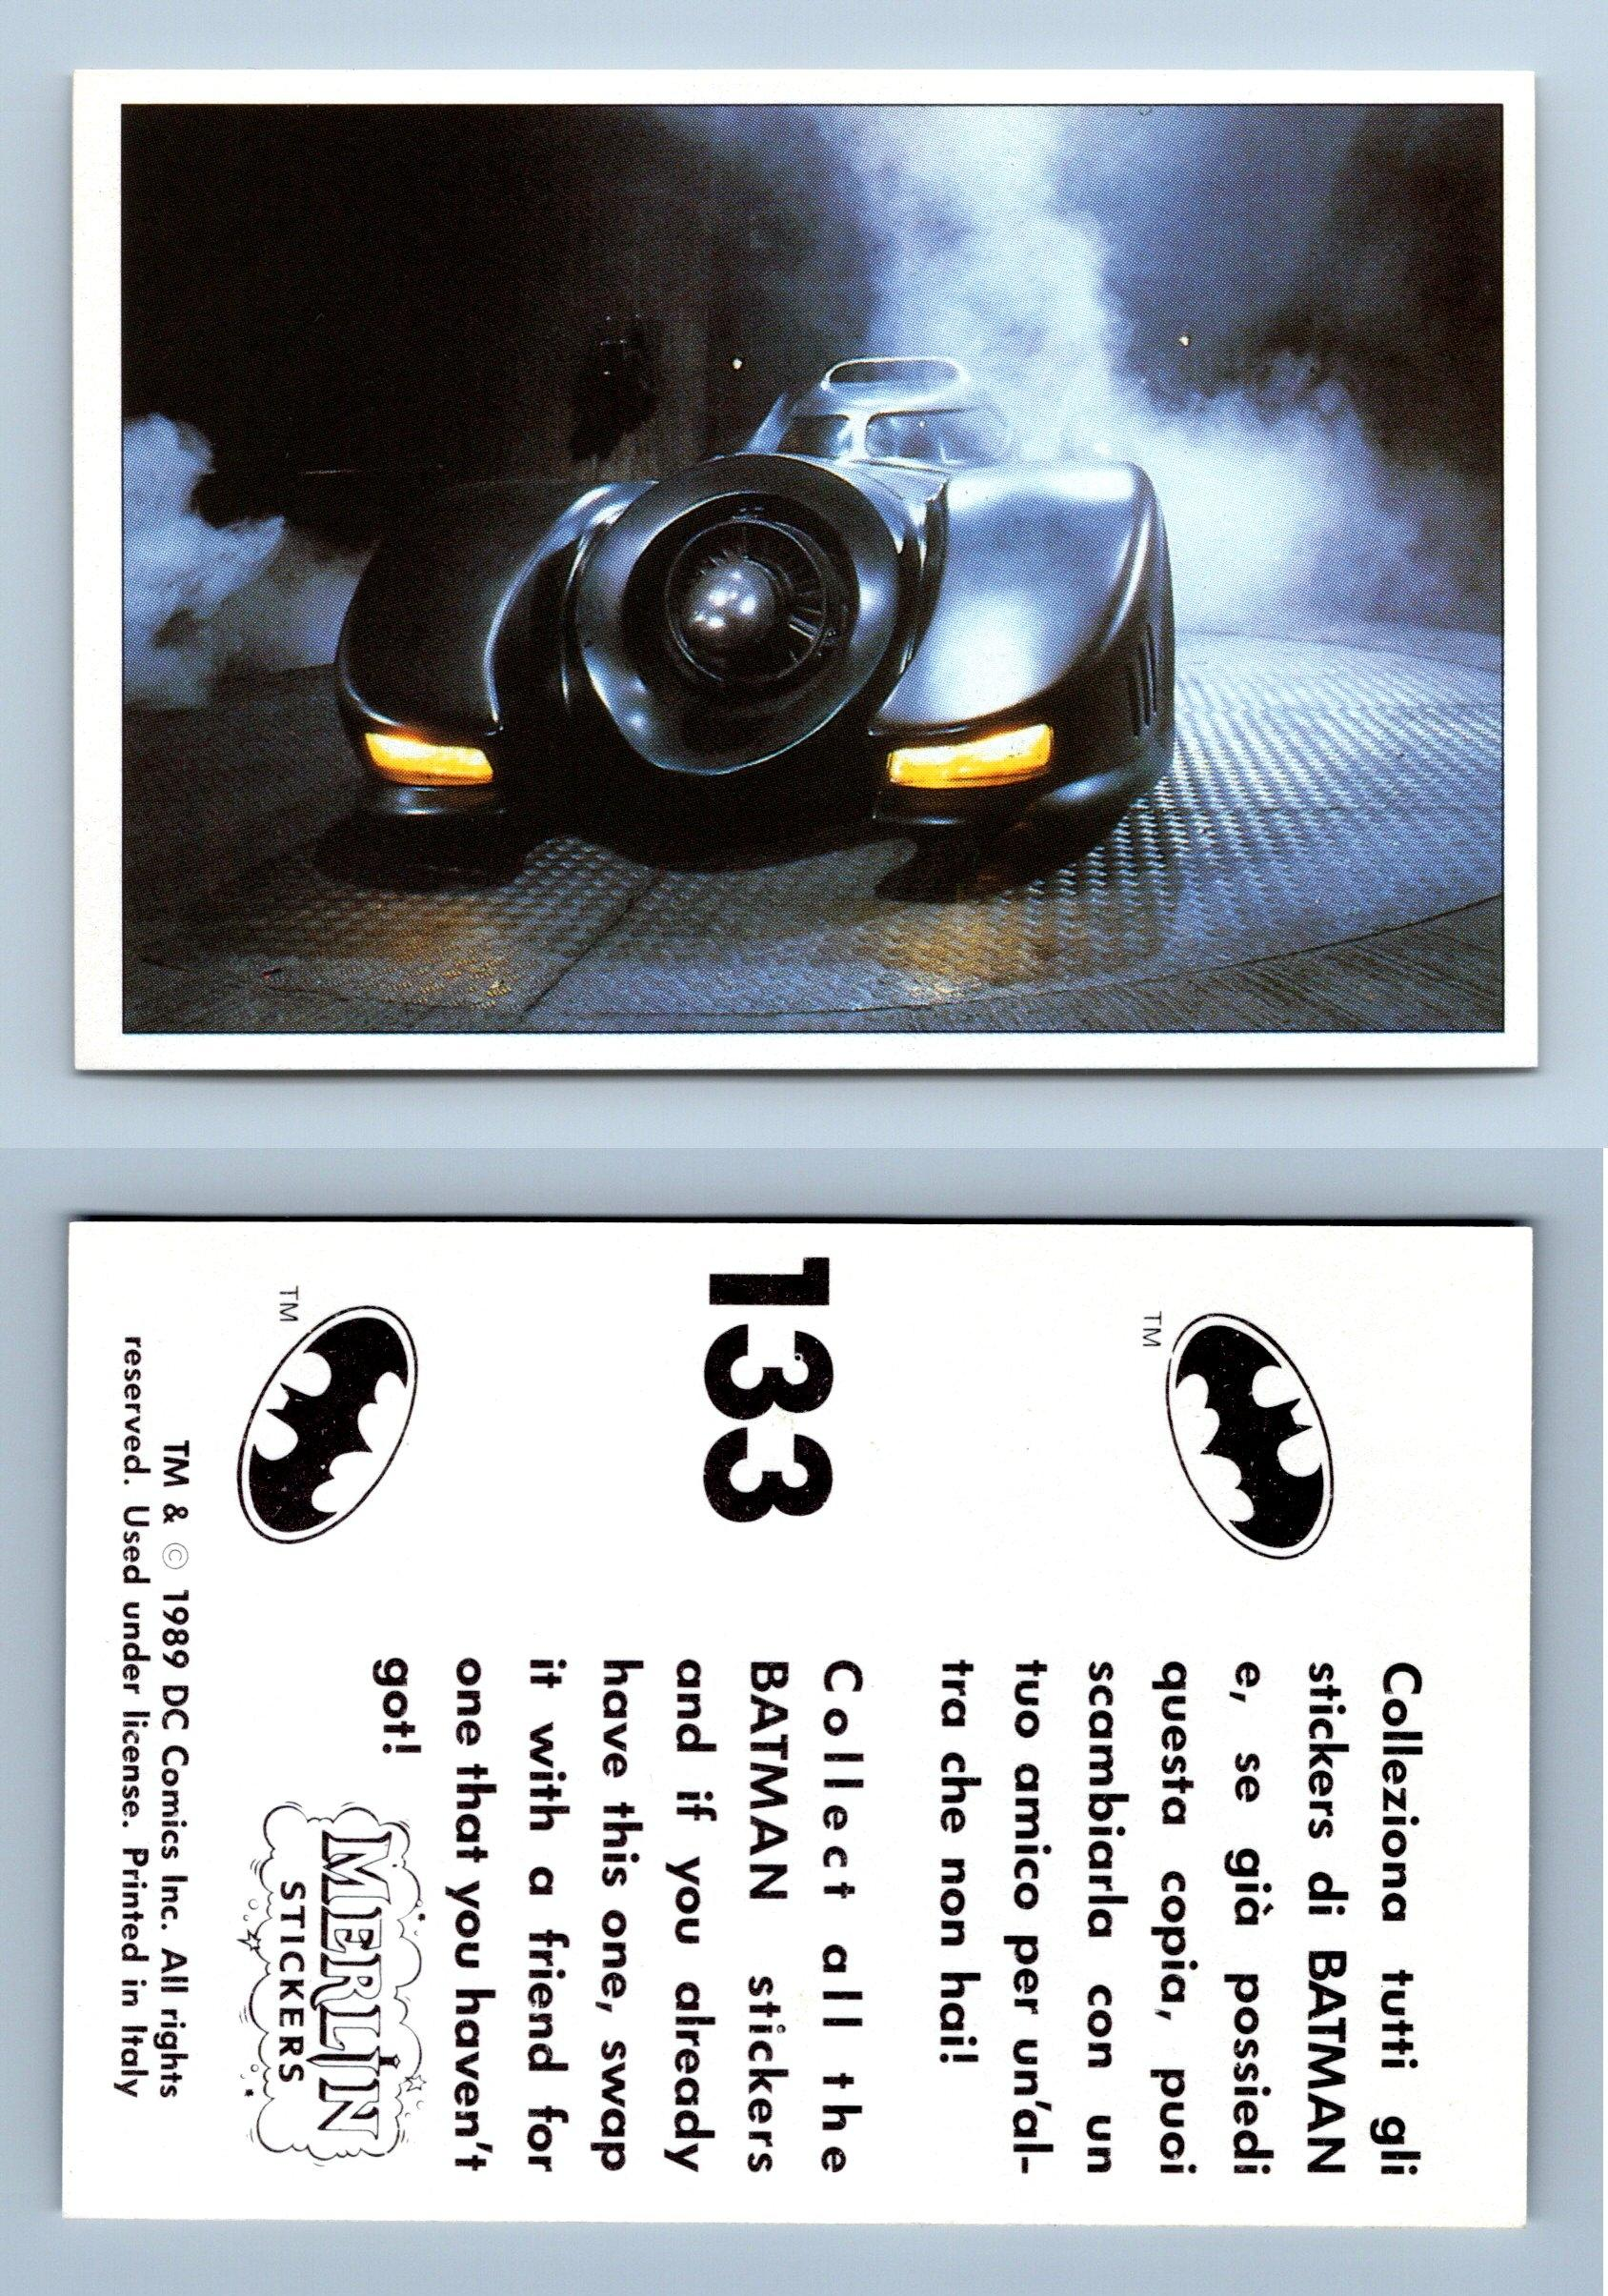 You Can Call Me Joker Batman Movie 1989 Merlin Iron-on Transfer